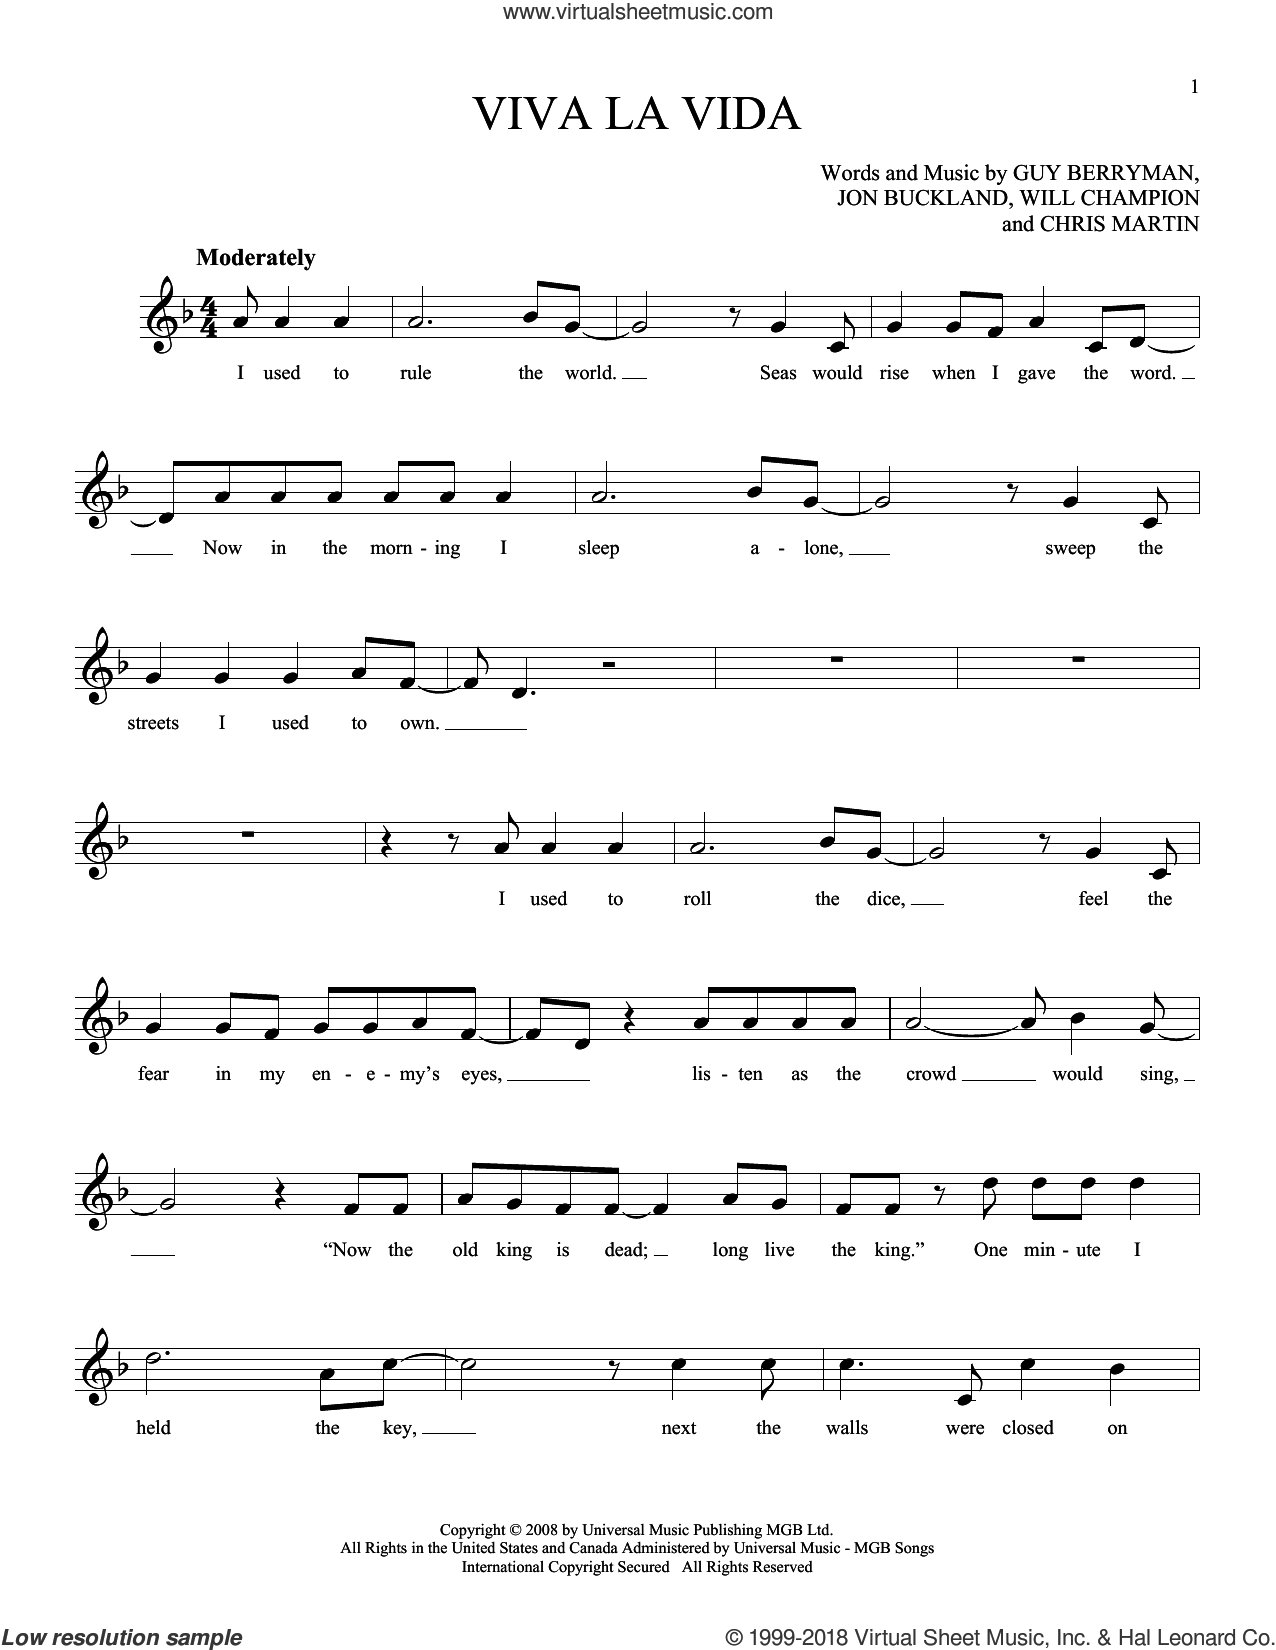 Viva La Vida sheet music for ocarina solo by Chris Martin, Coldplay, Guy Berryman, Jon Buckland and Will Champion, intermediate skill level